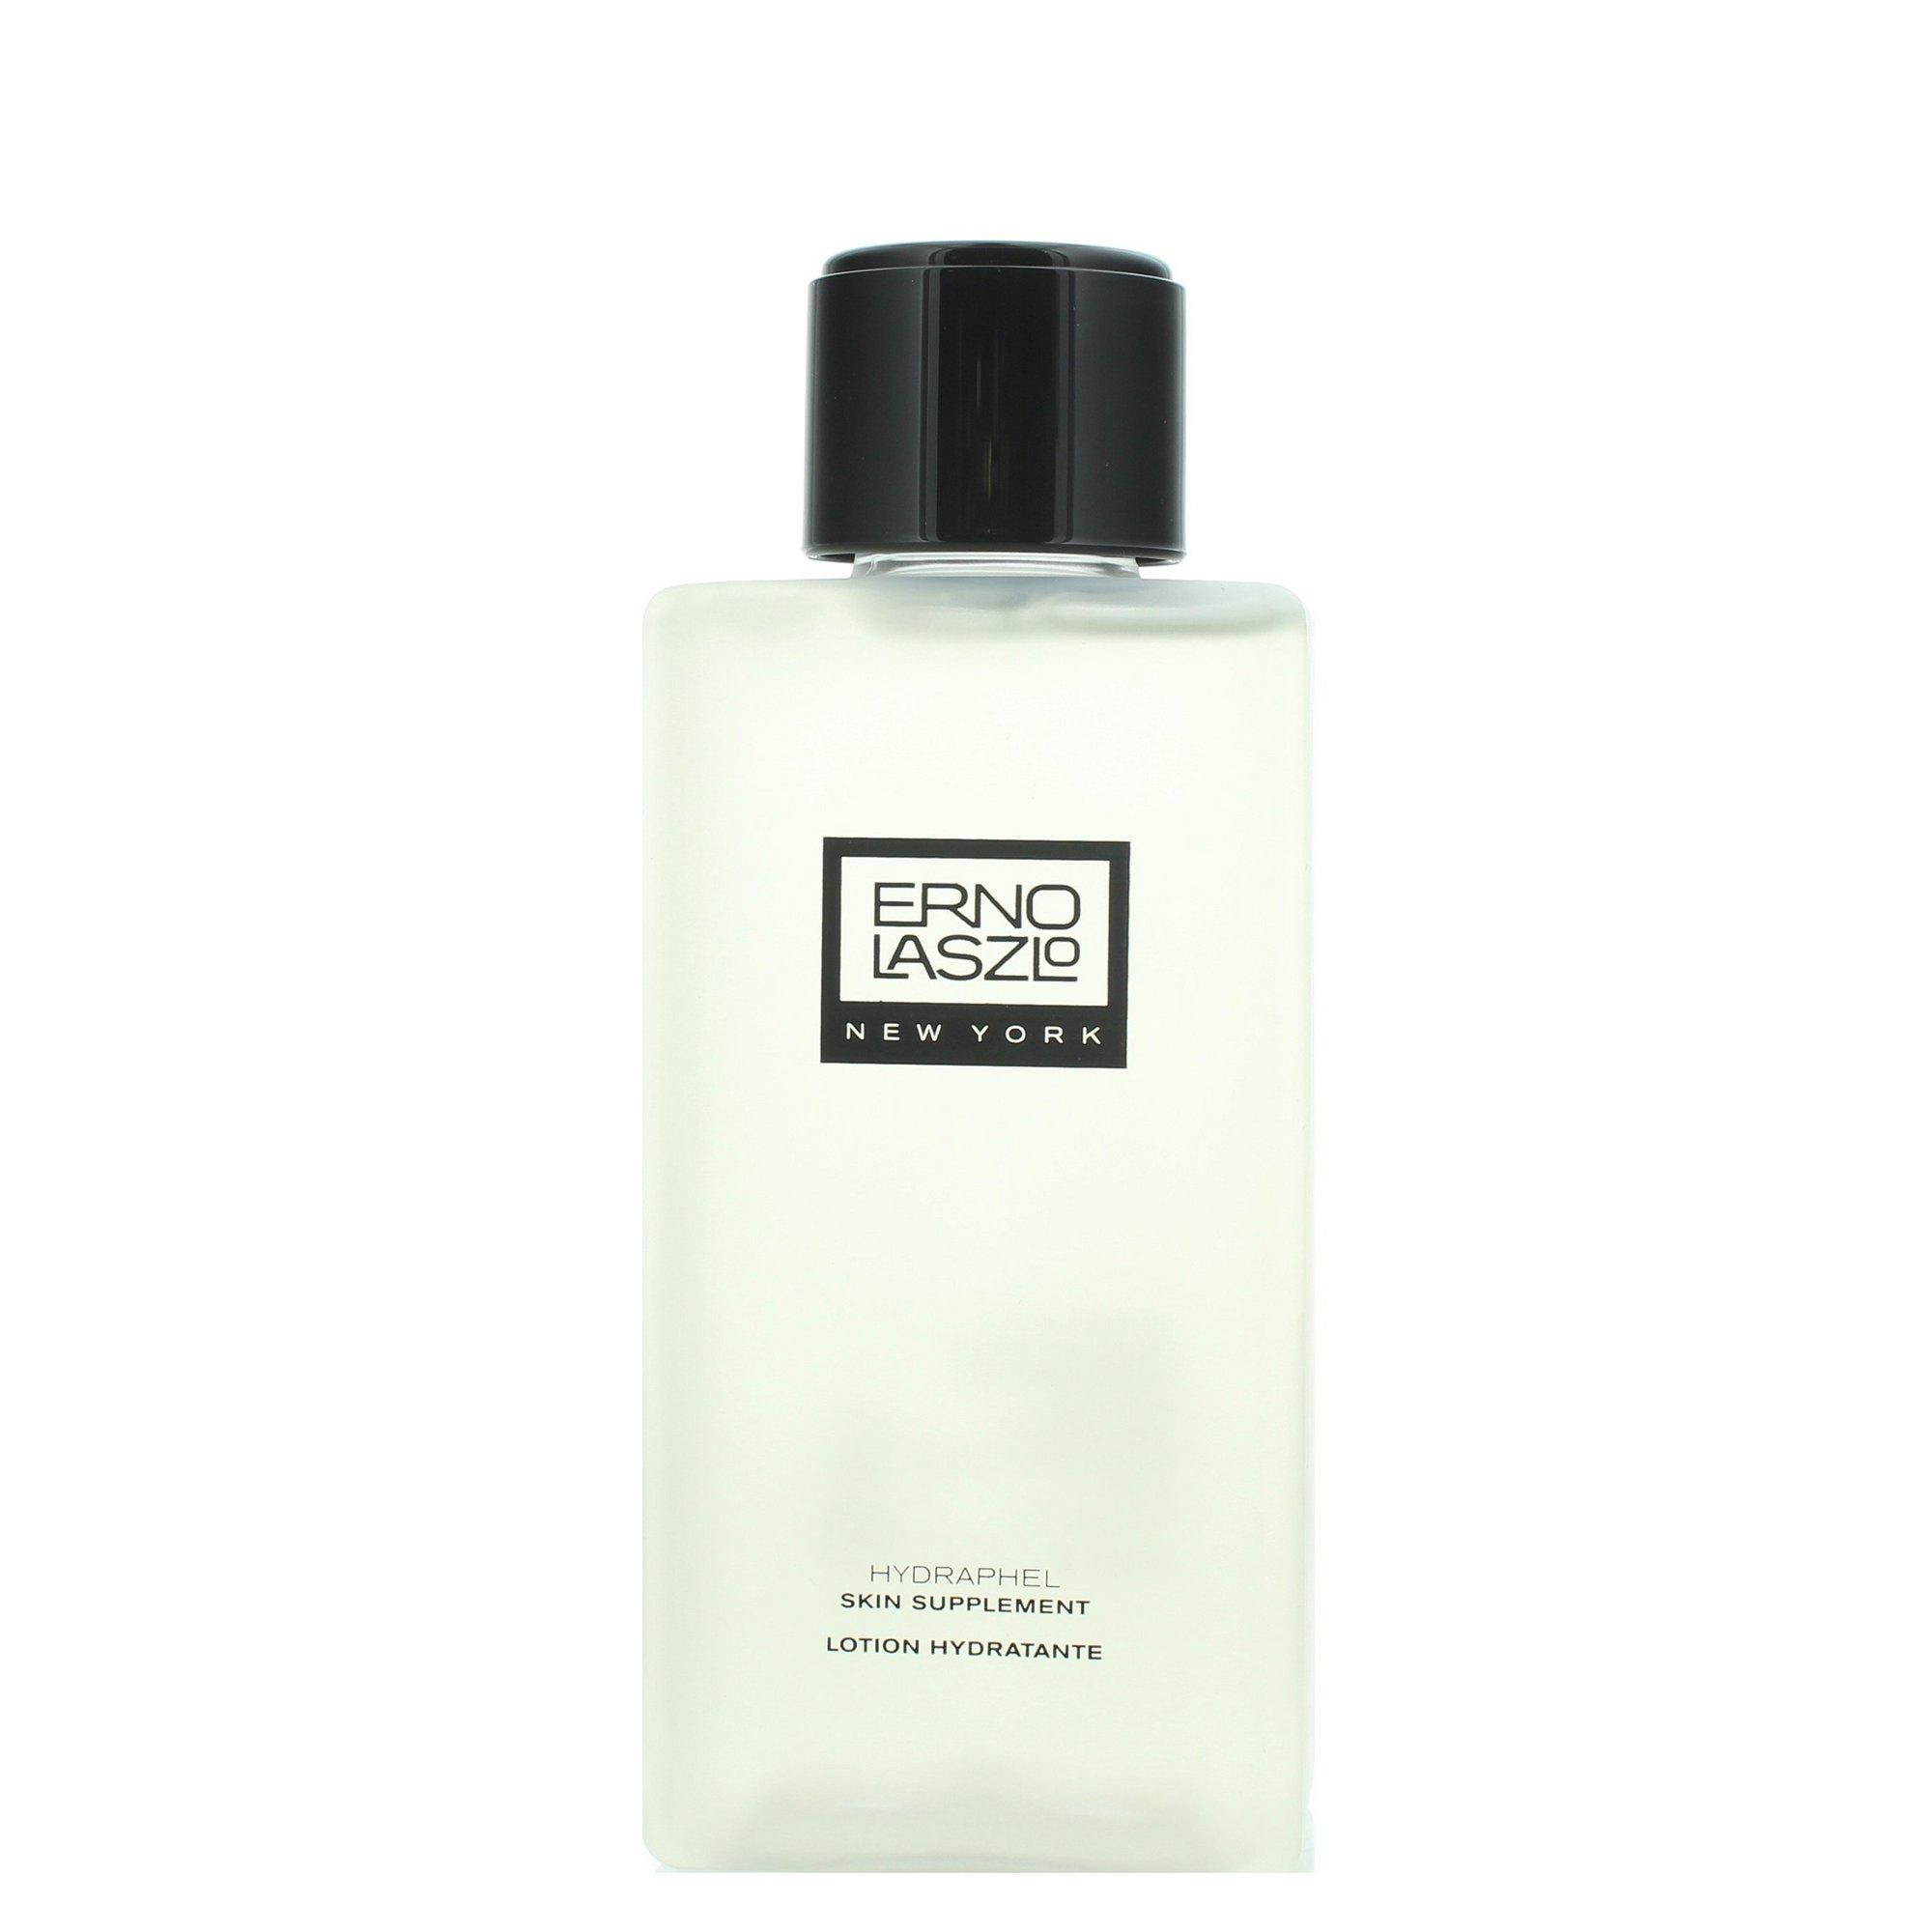 Image of Erno Laszlo Hydraphel Skin Supplement